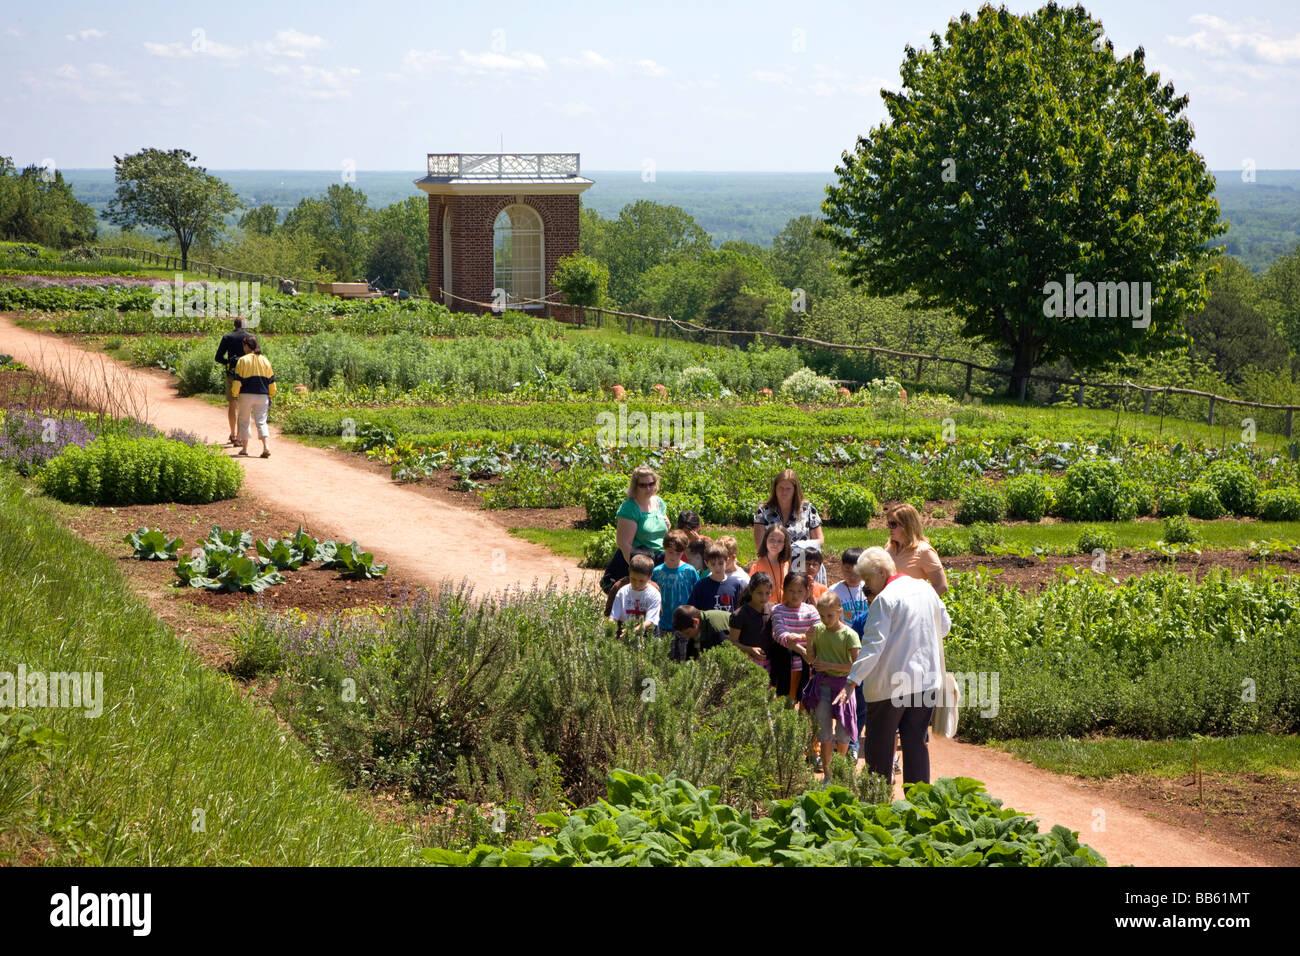 School vegetable gardens - School Children Tour The Vegetable Gardens At Monticello Thomas Jefferson Former Home Plantation Near Charlottesville